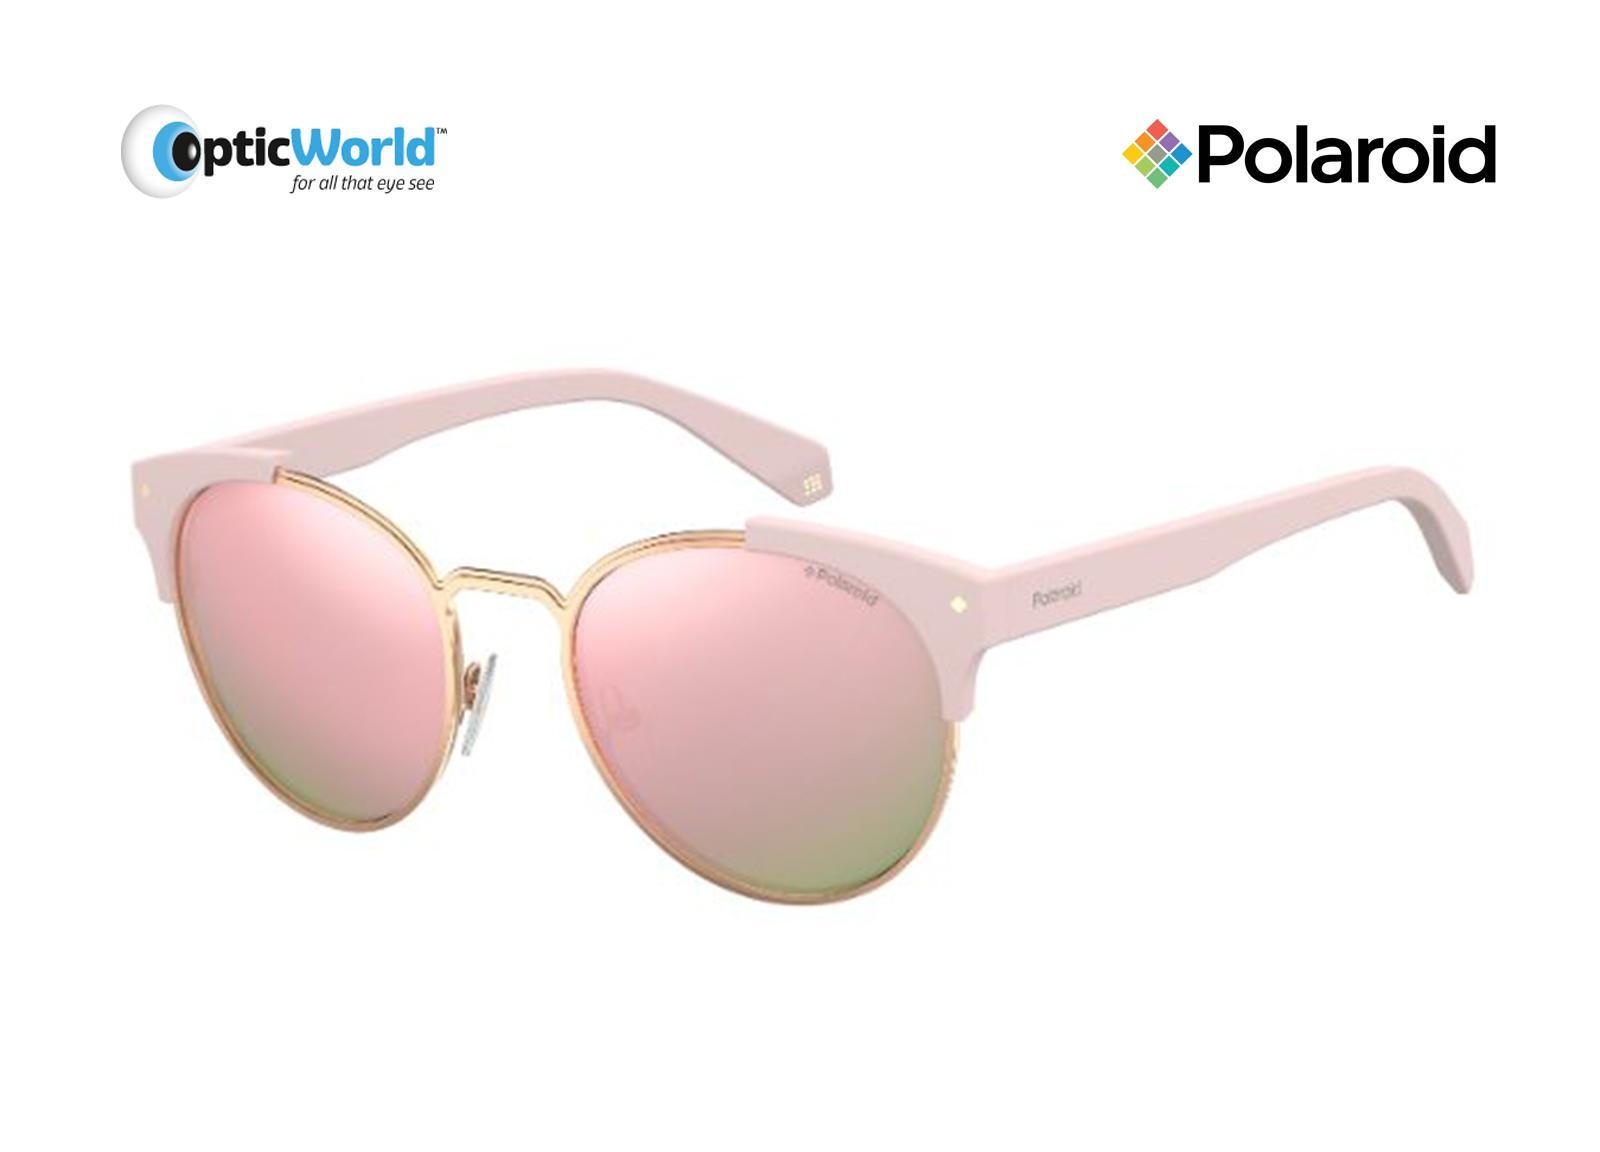 17b4b371c07 Sunglasses Polaroid Polarized Original Pld6038 s x 8kj 0j 56 Coral ...